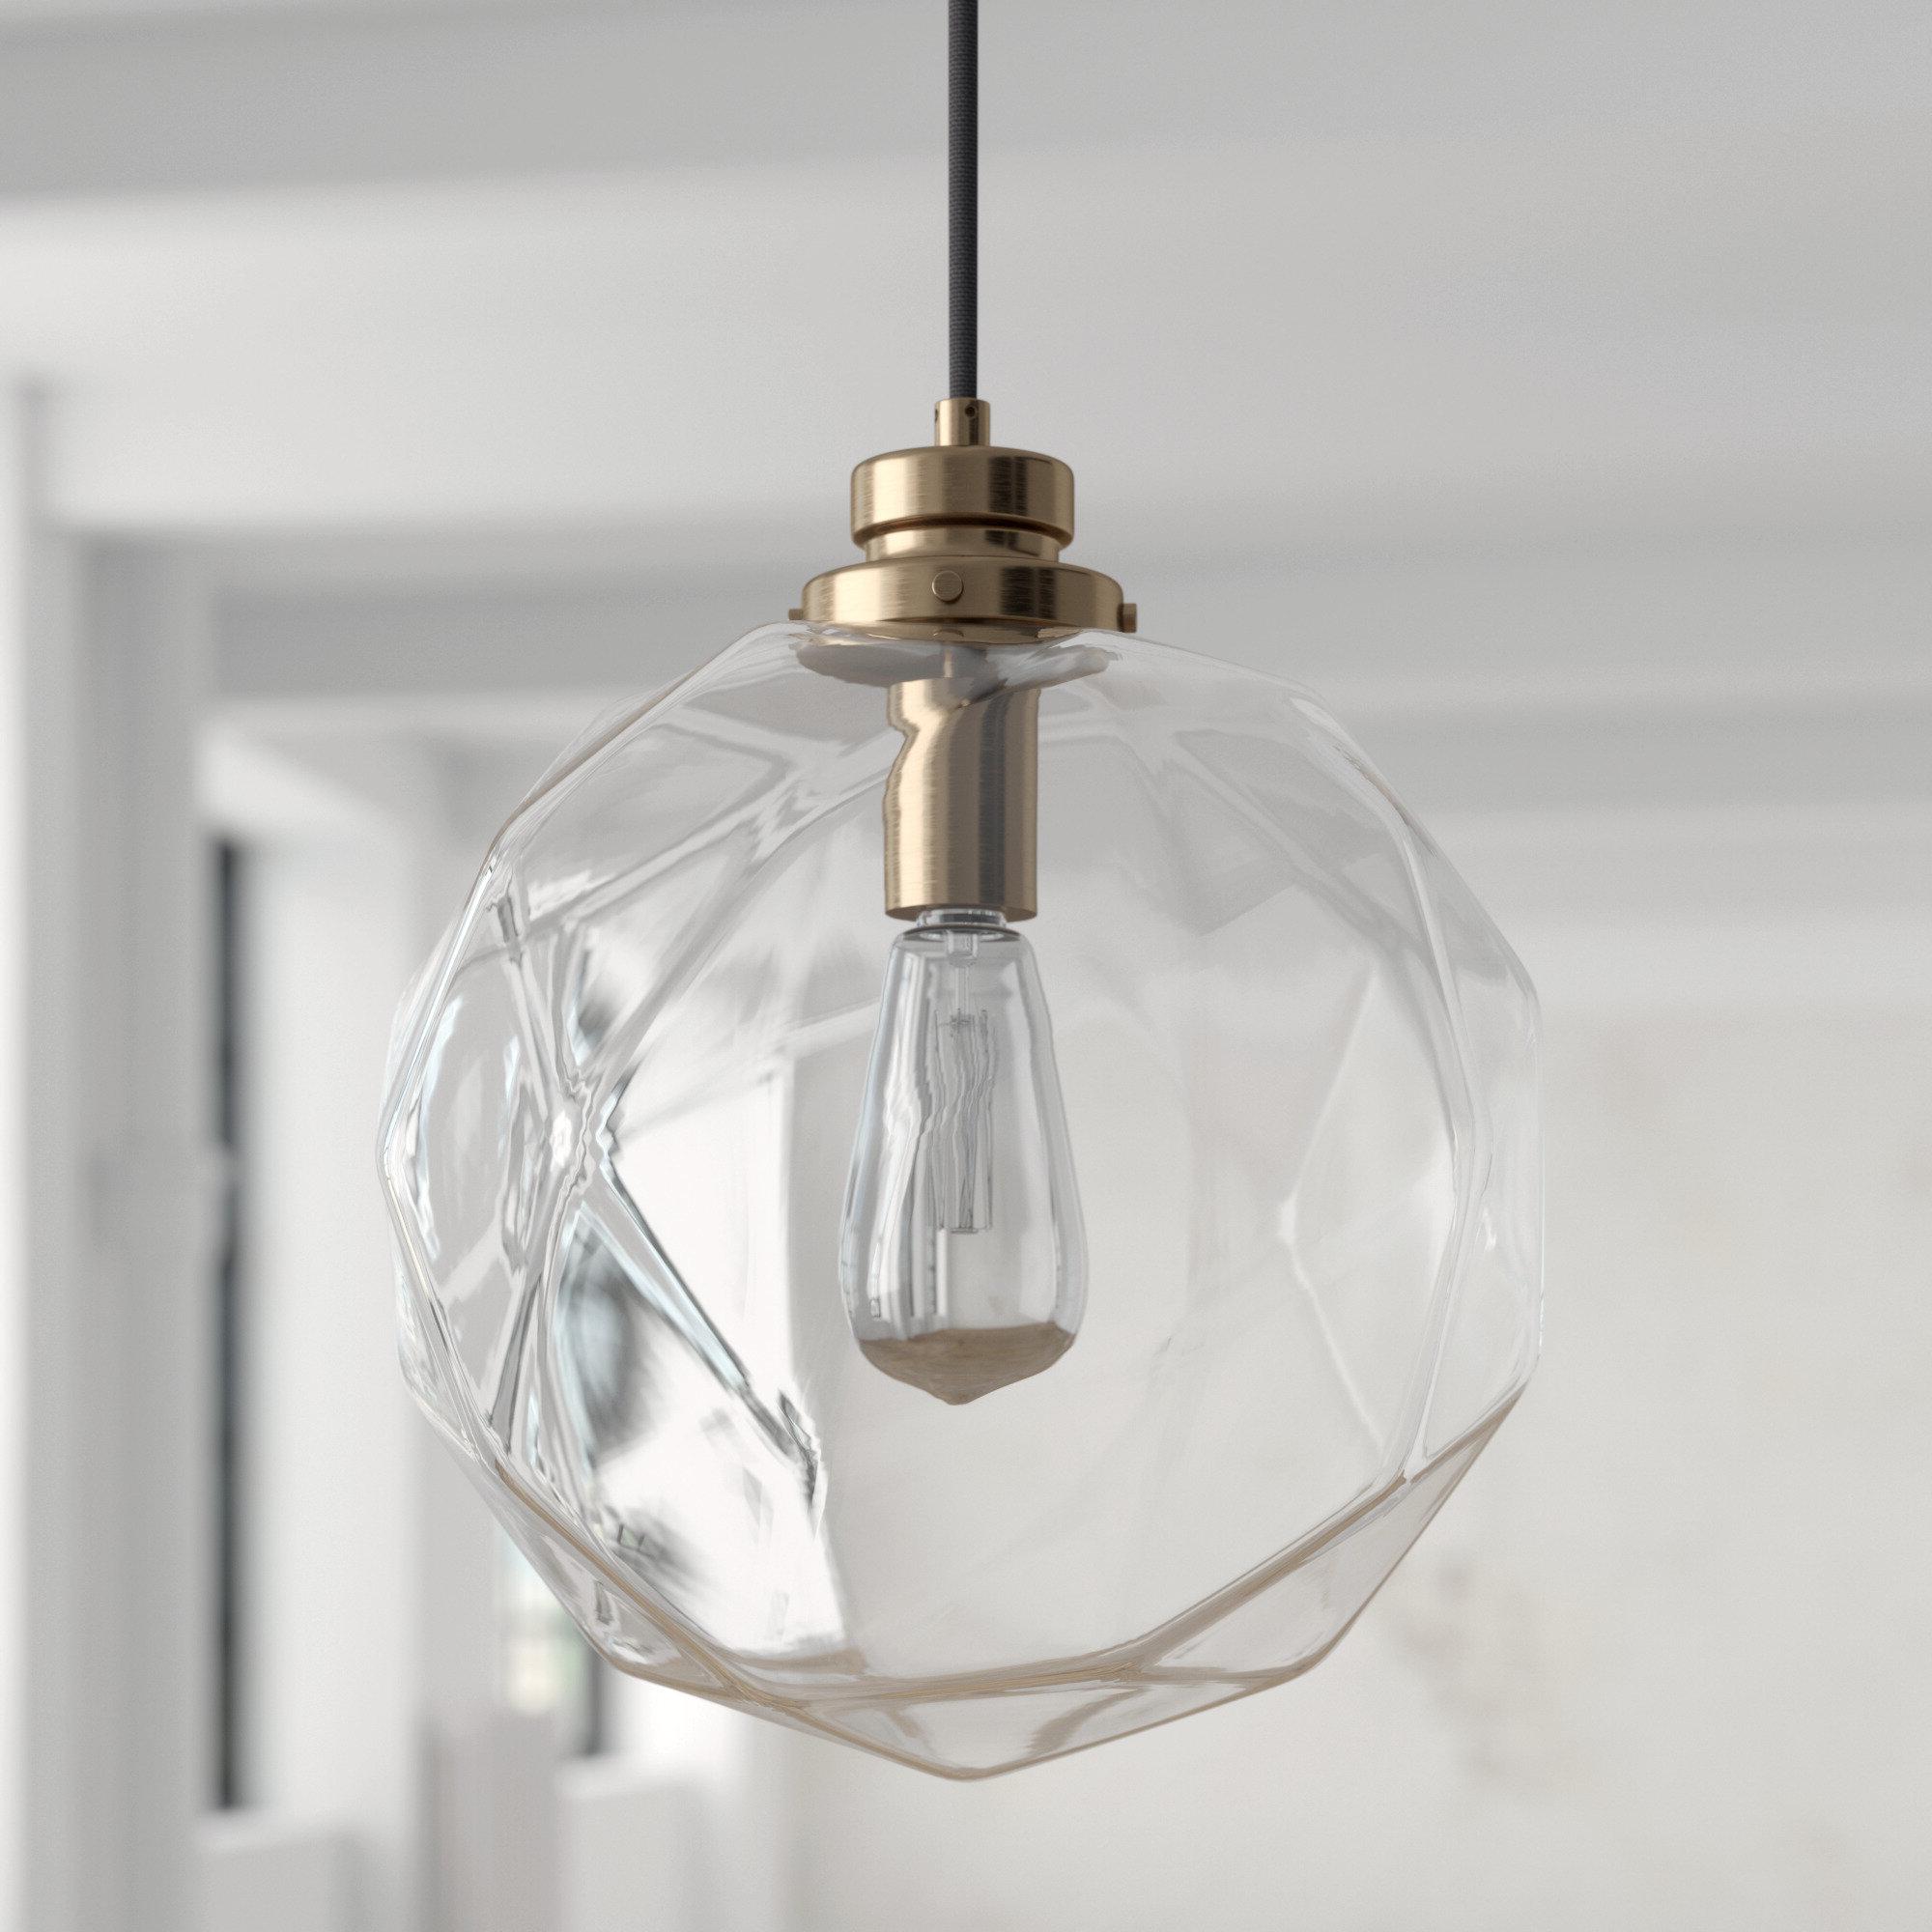 1 Light Geometric Globe Pendants In Best And Newest 1 Light Geometric Globe Pendant (View 3 of 20)